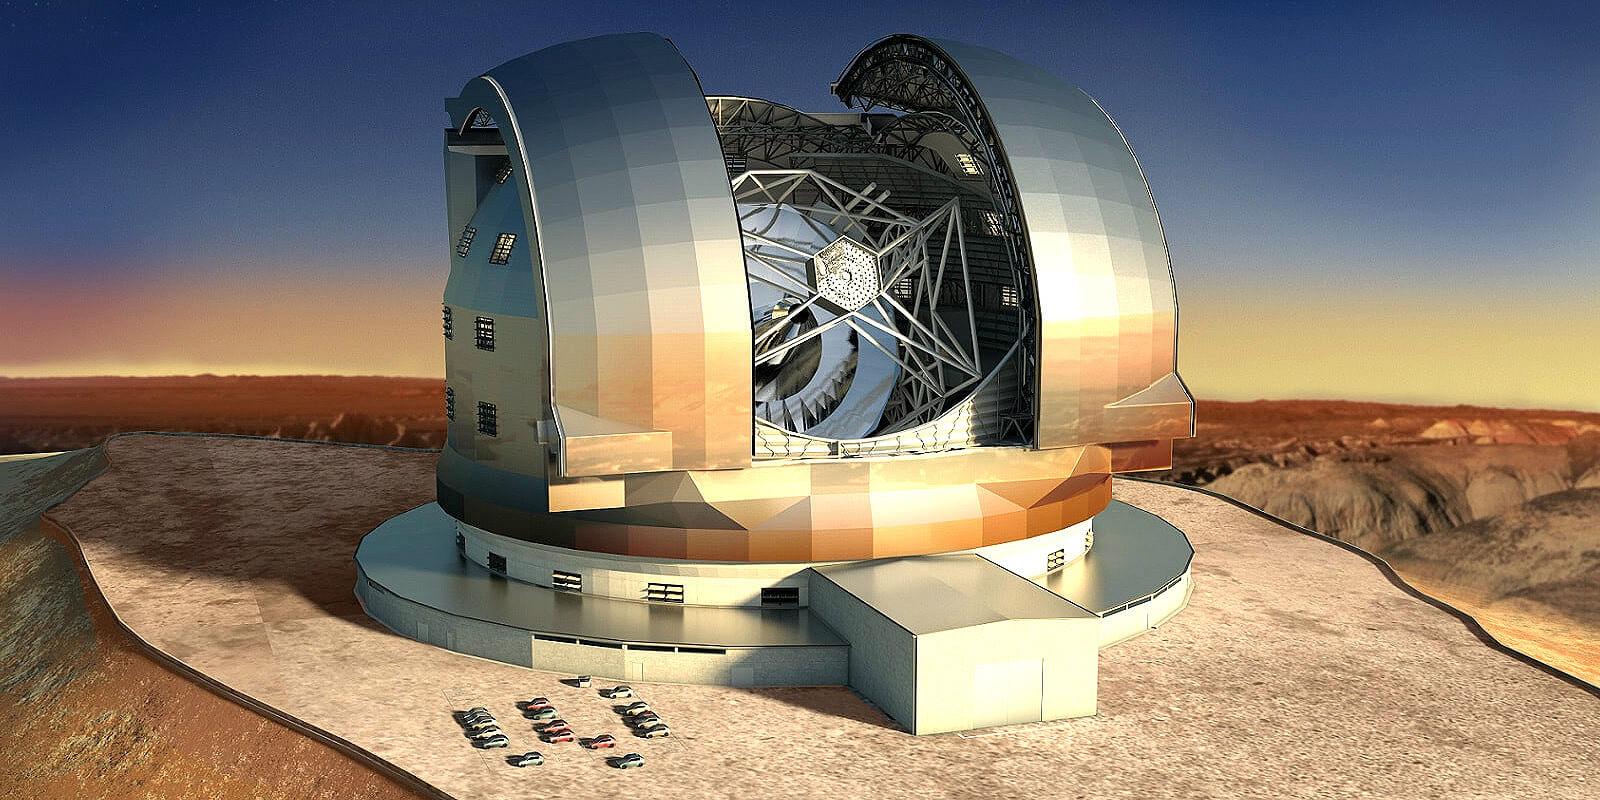 E-ELT_European_Extremely_Large_Telescope_Dome_Astronomy_Chile_IDOM_ADA_8_